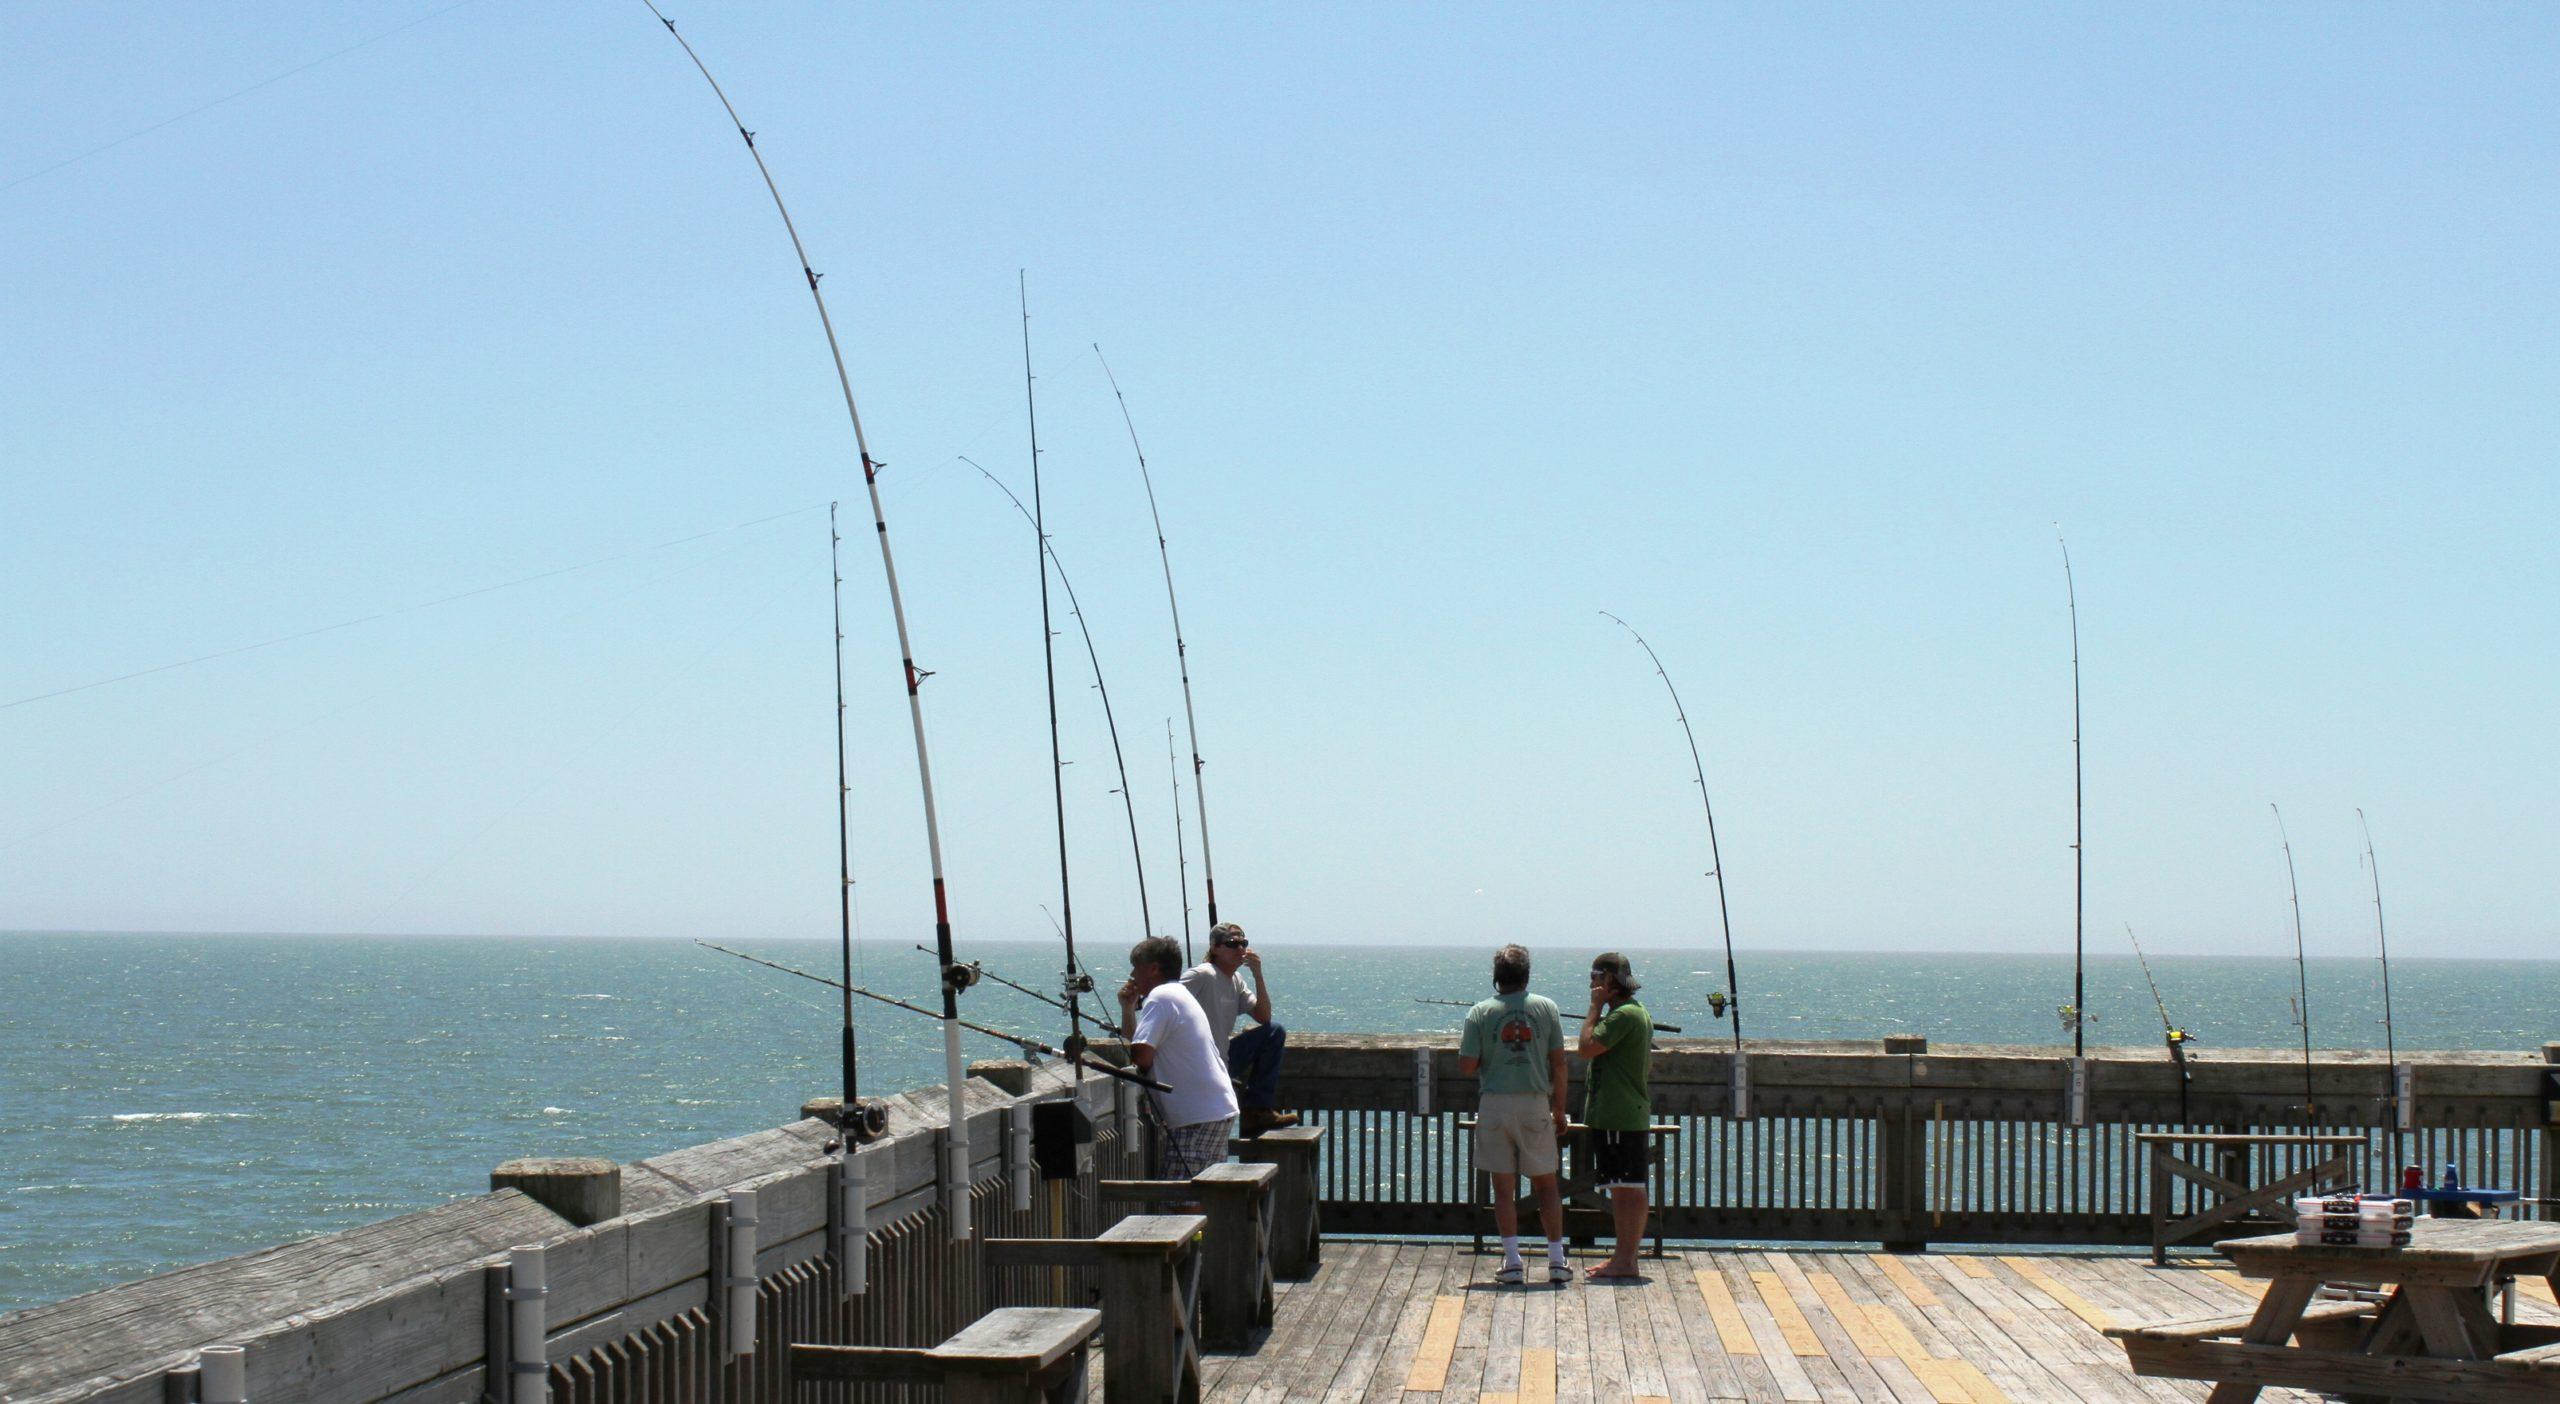 King Mackerel Pier//Bridge Anchors *Lot of 10*